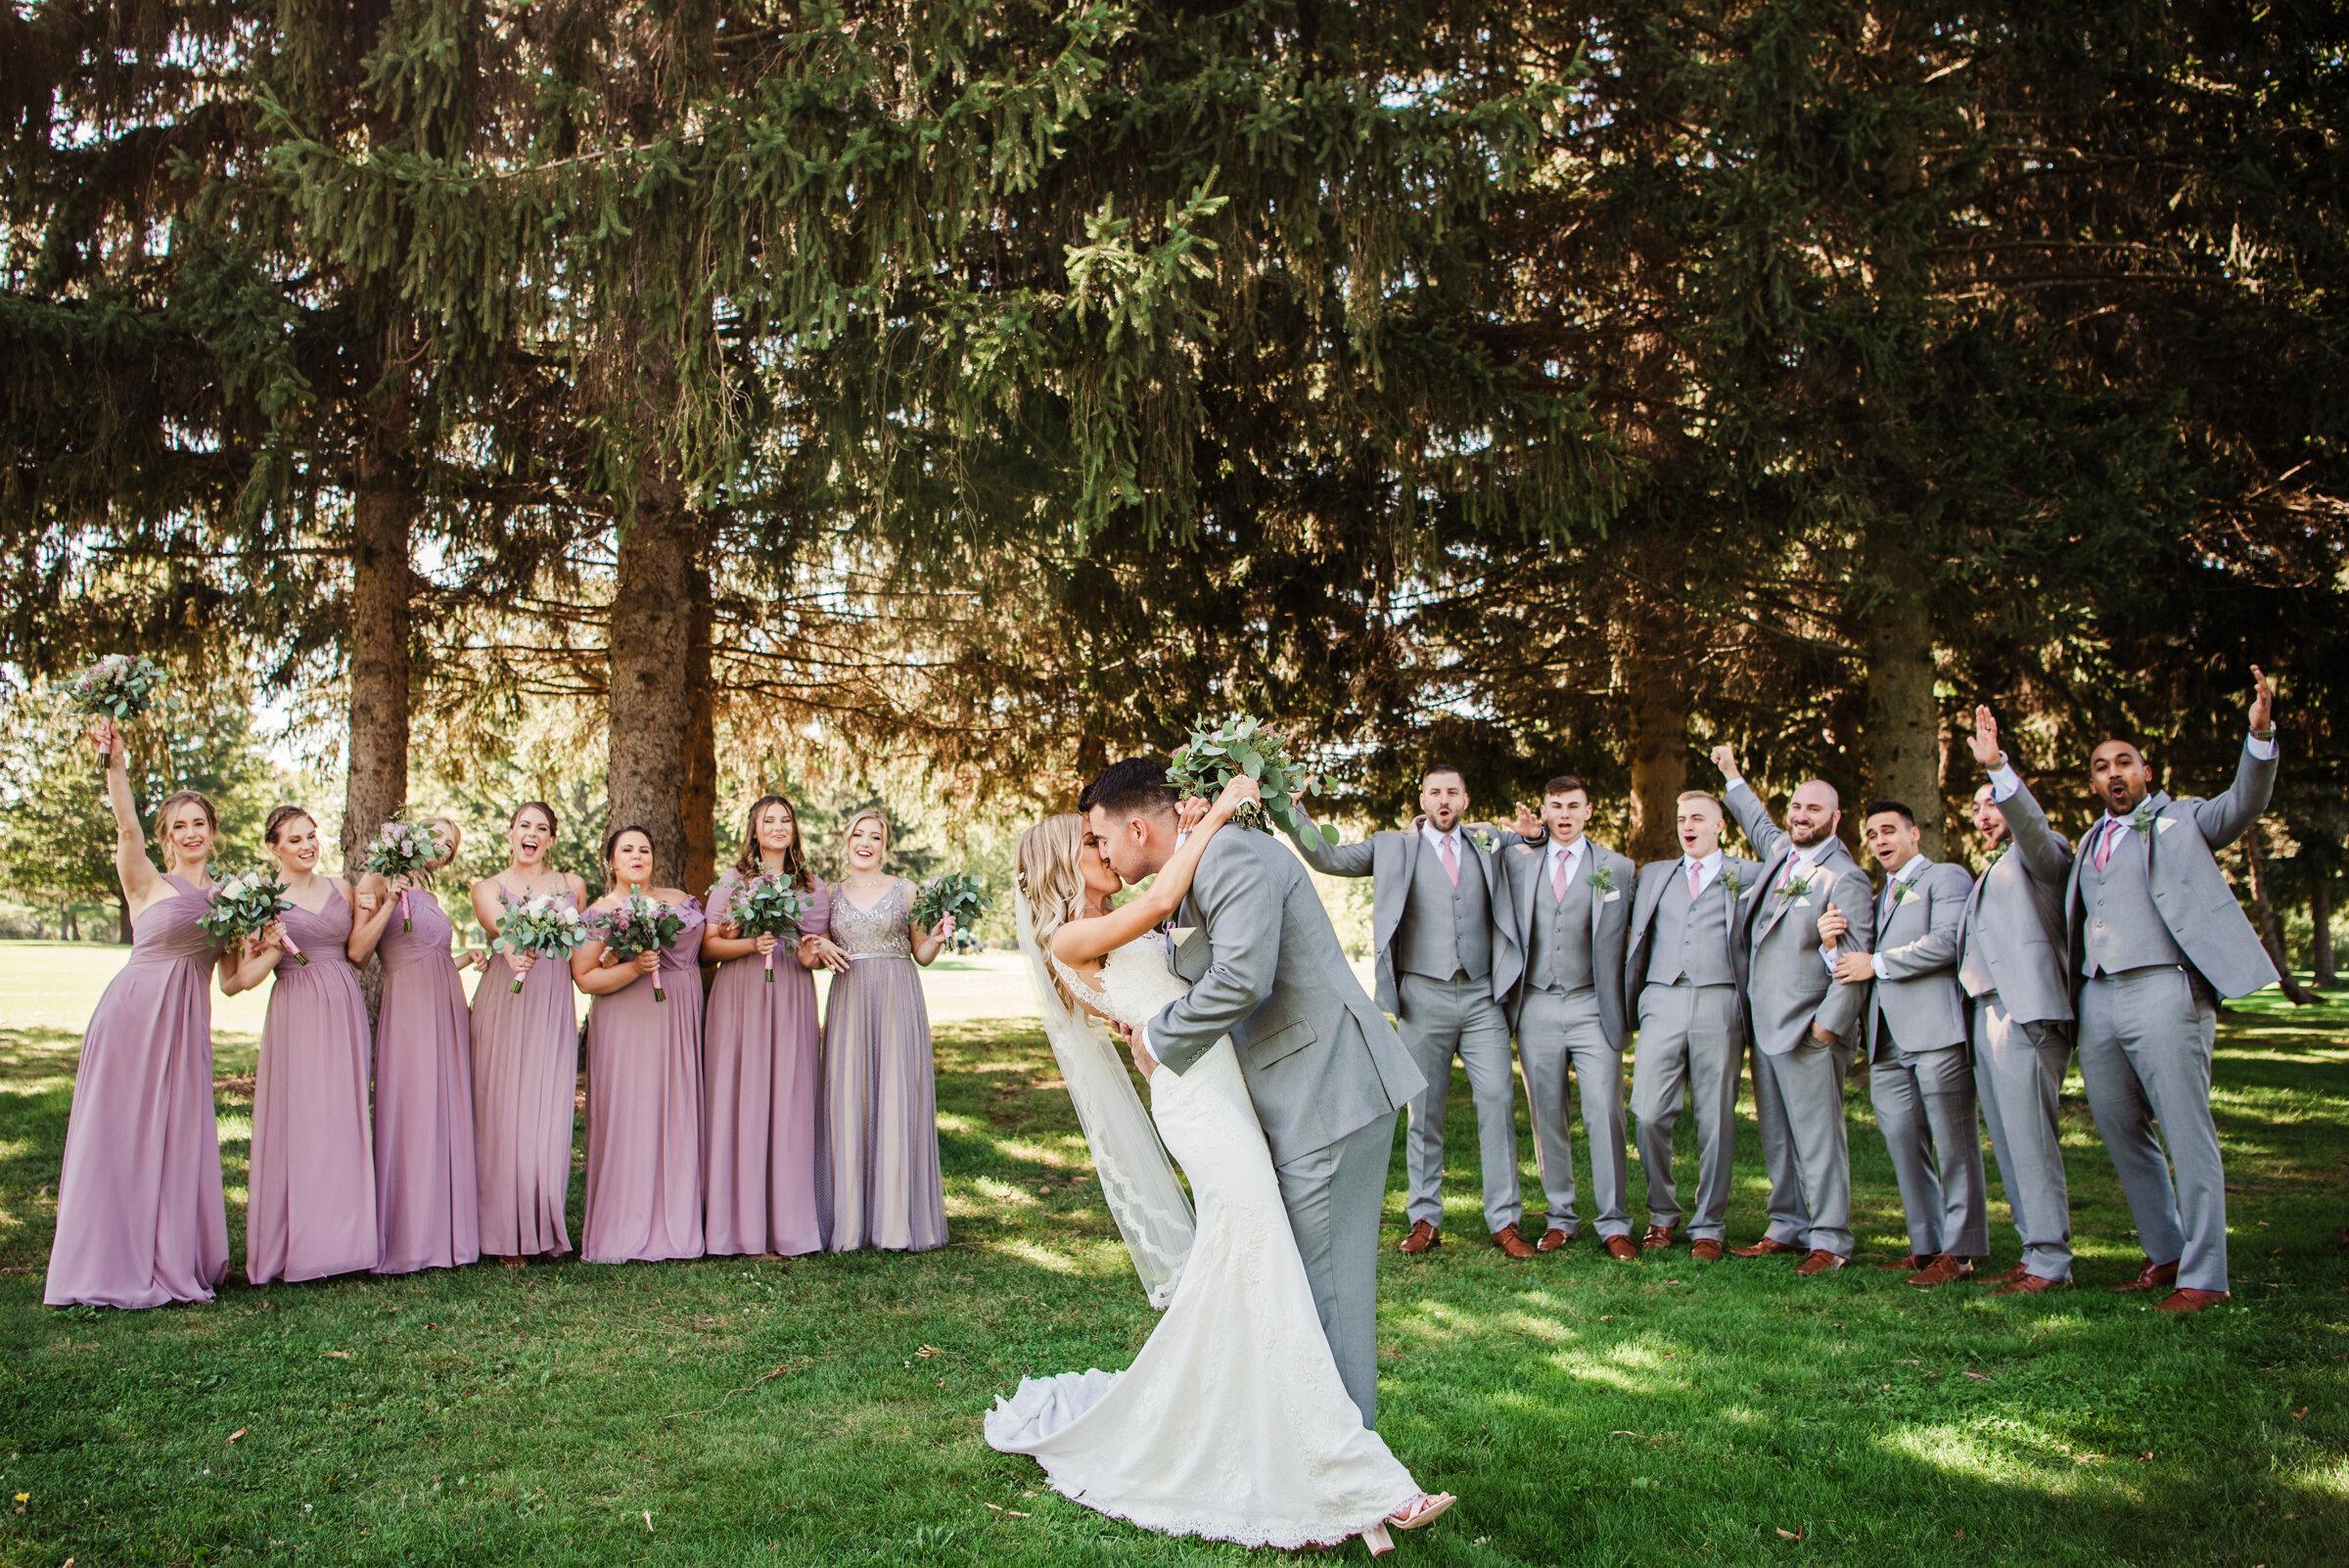 Deerfield_Country_Club_Rochester_Wedding_JILL_STUDIO_Rochester_NY_Photographer_DSC_6244.jpg